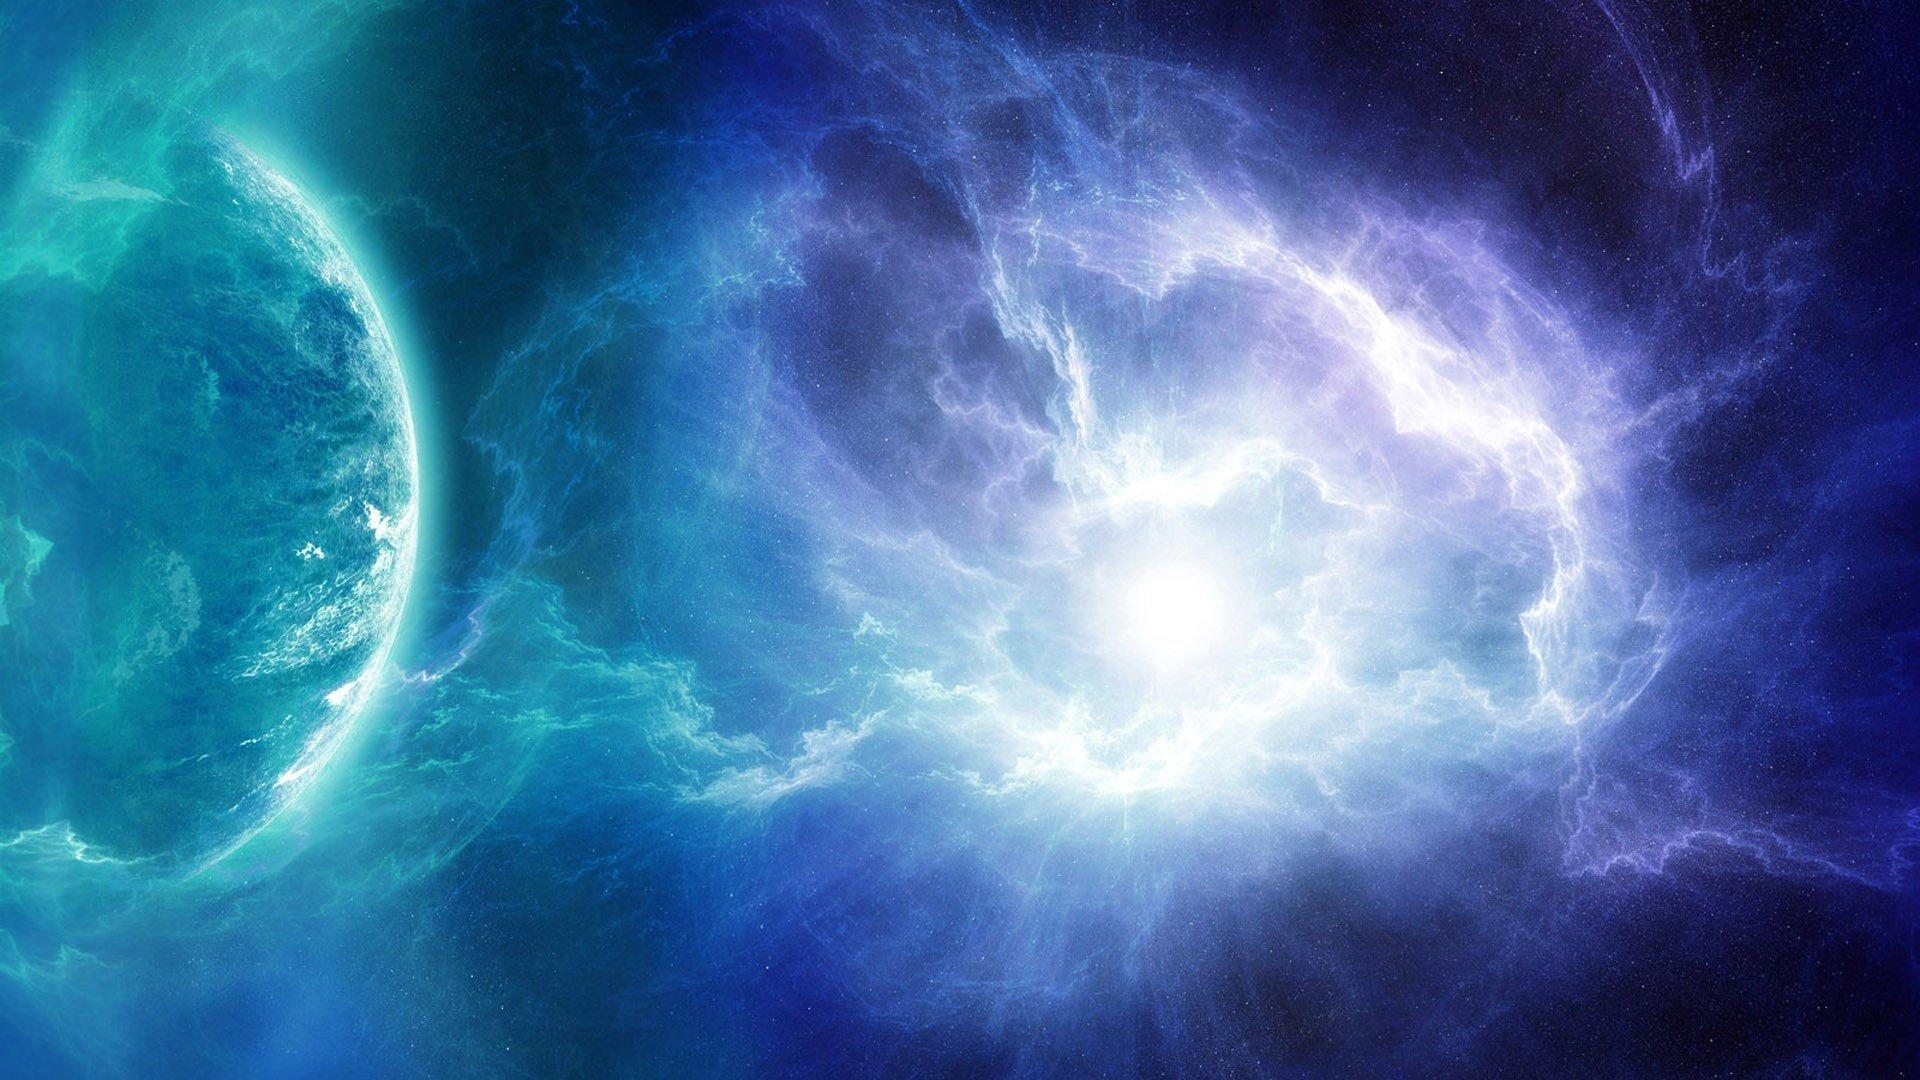 Wallpaper Focus >> Le plasma, l'état fondamental de la matière -- Science et ...